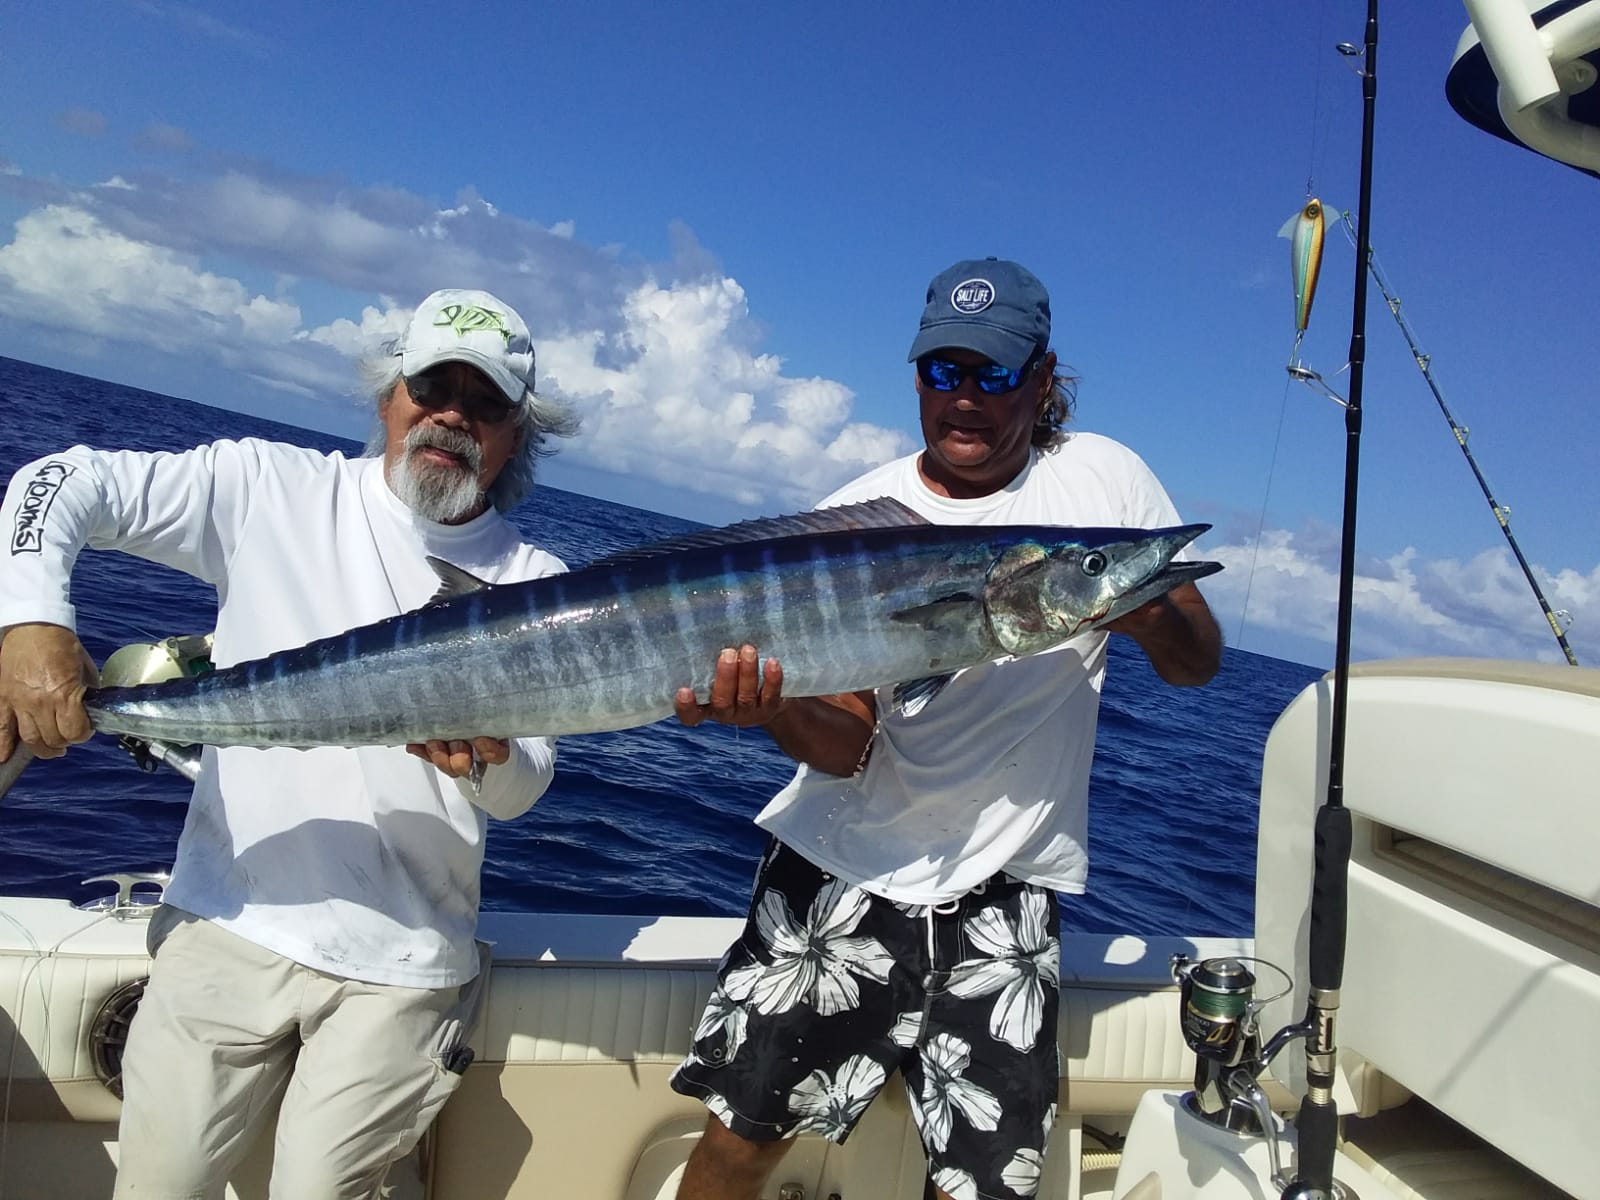 Ono Mahi Marlin Whaoo Silver Sparkle Sailfish Tuna Daisy Chain Leader